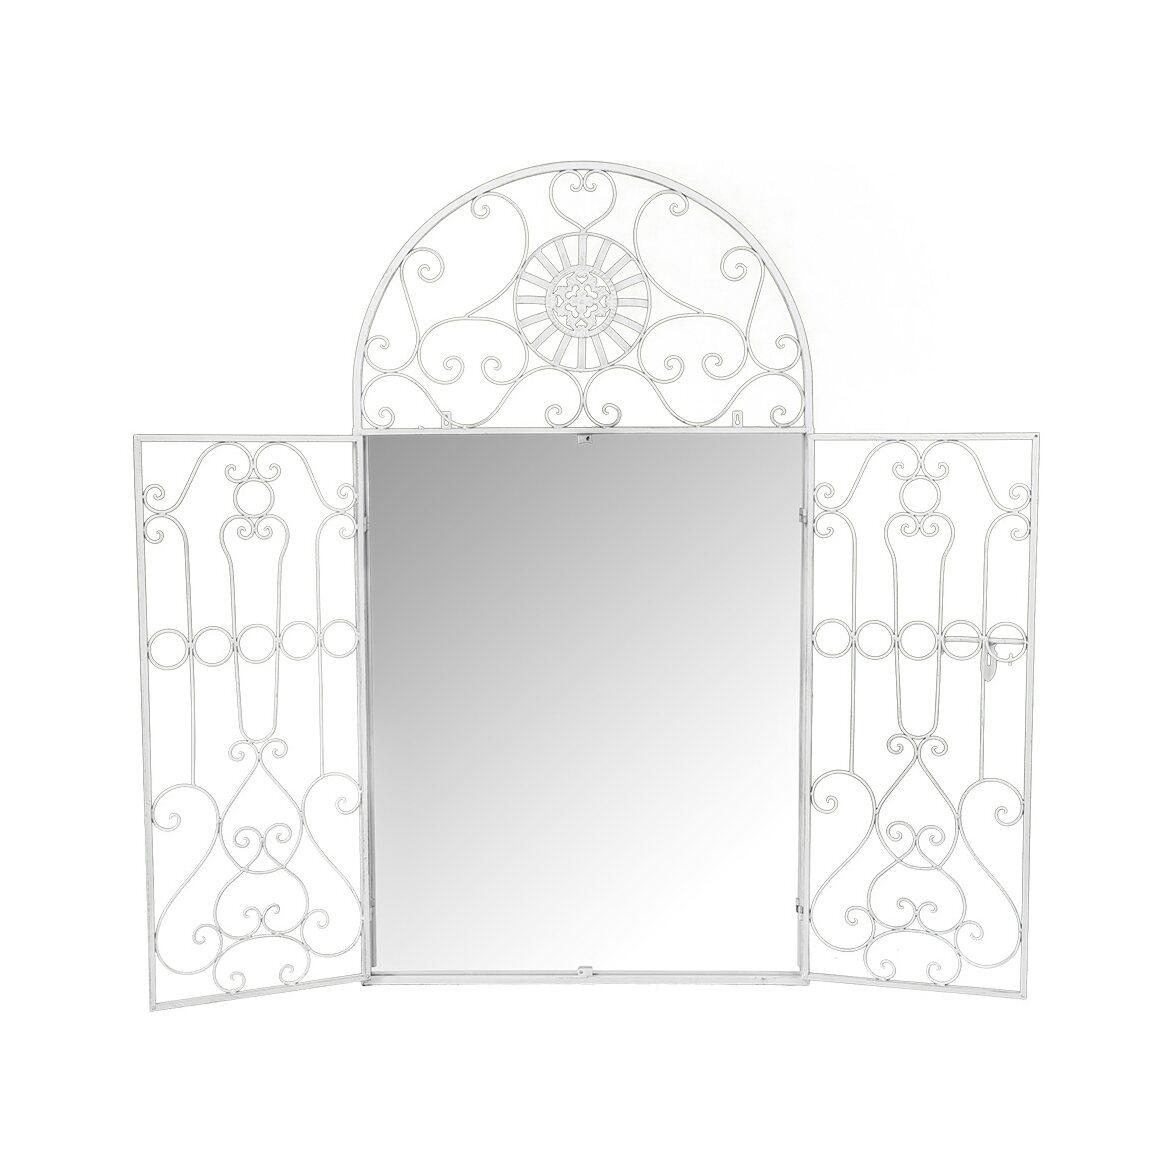 Настенное зеркало «Дивон» (белый антик) 2 | Настенные зеркала Kingsby